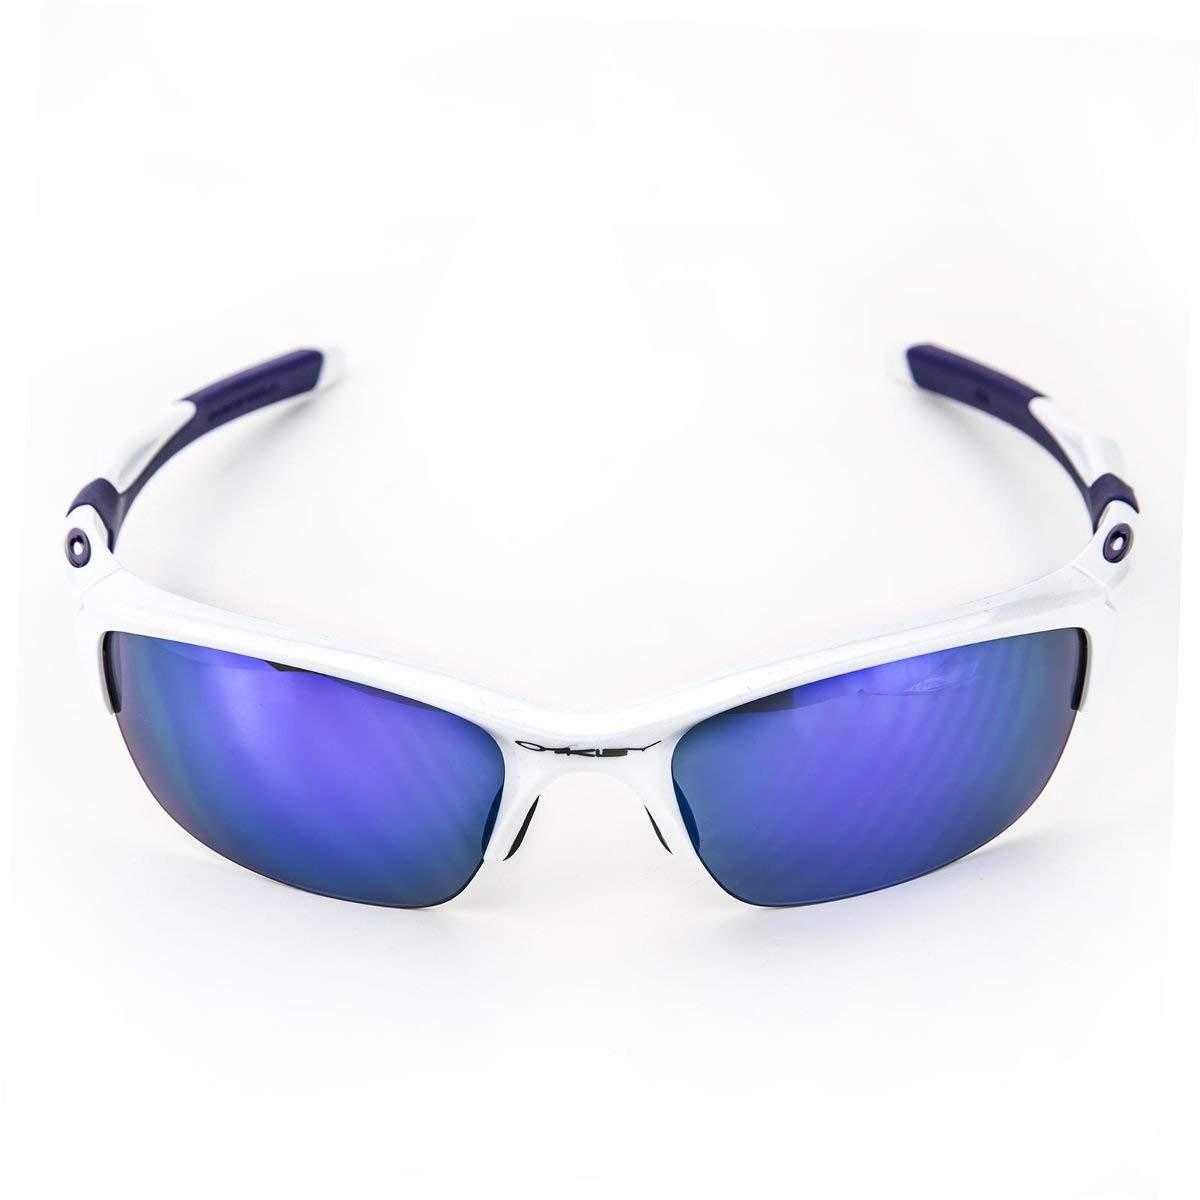 Oakley Men's Non-Polarized Half Jacket 2.0Oval Sunglasses,Pearl Frame/Violet Iridium Lens, 62 mm